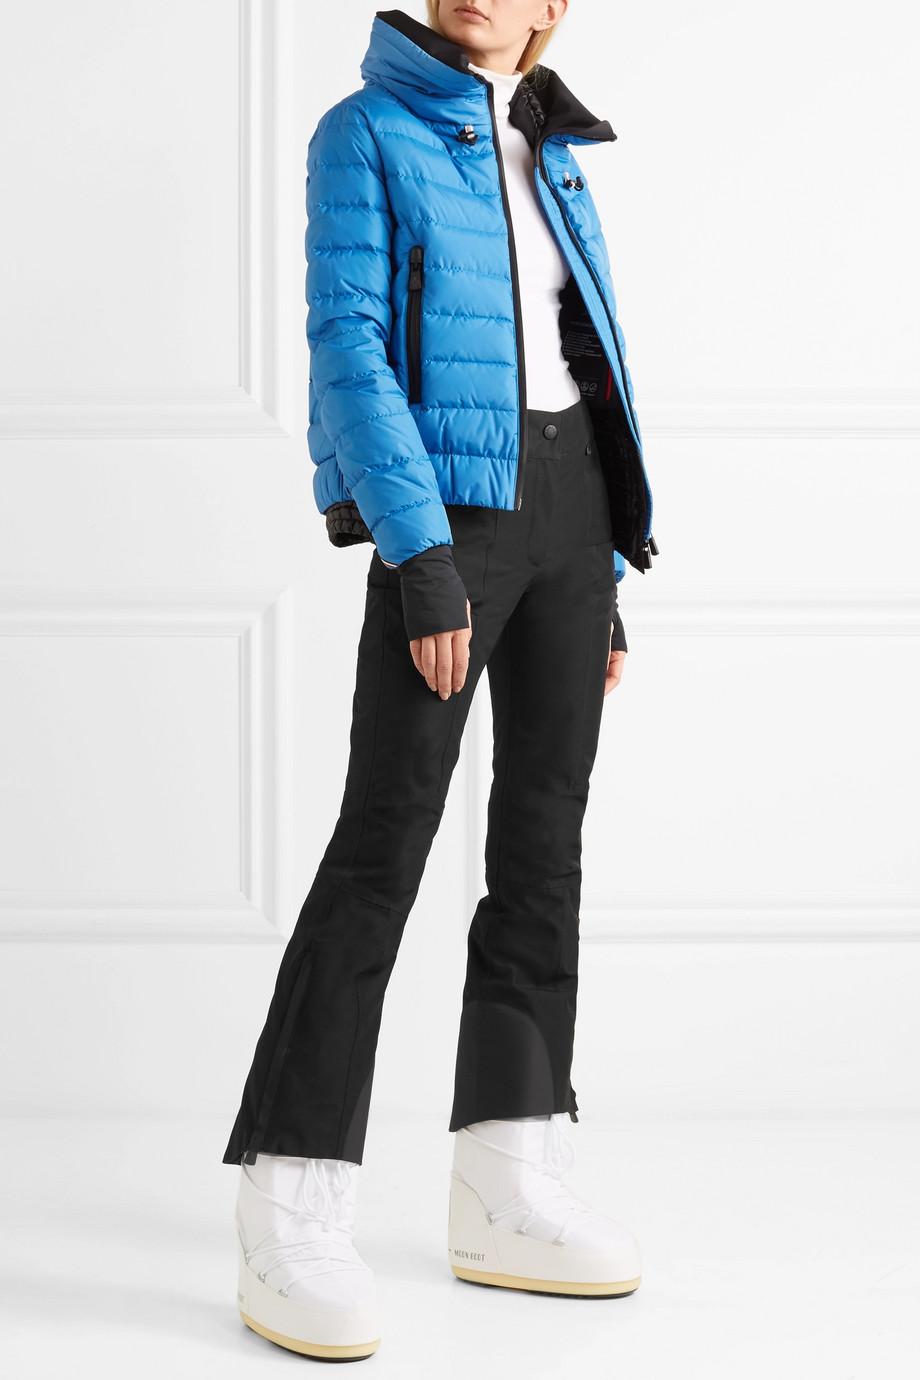 Moncler Grenoble Pantalon de ski évasé